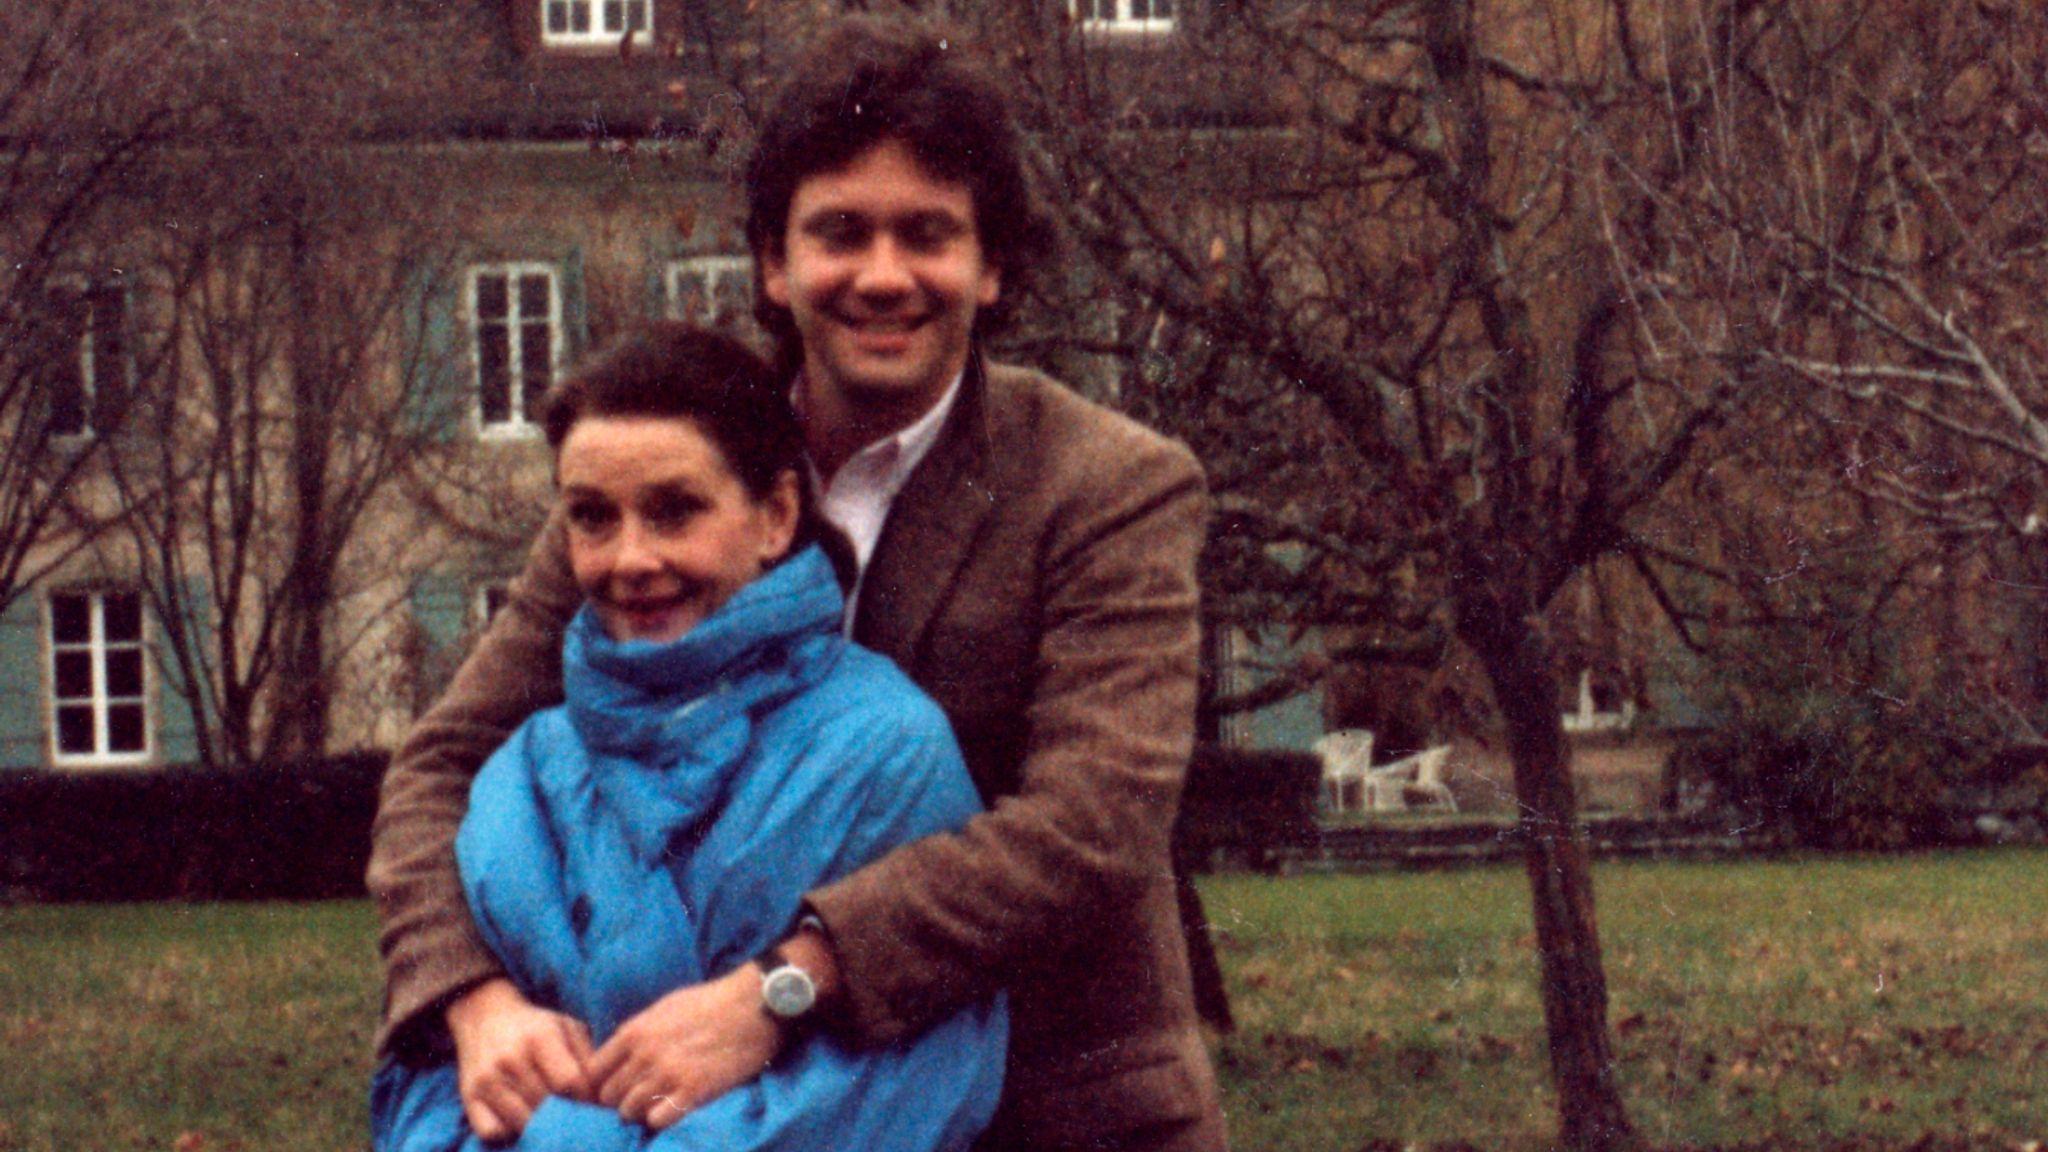 Audrey Hepburn, Sean Hepburn Ferrer 1993 Jan. with Sean, La Paisible